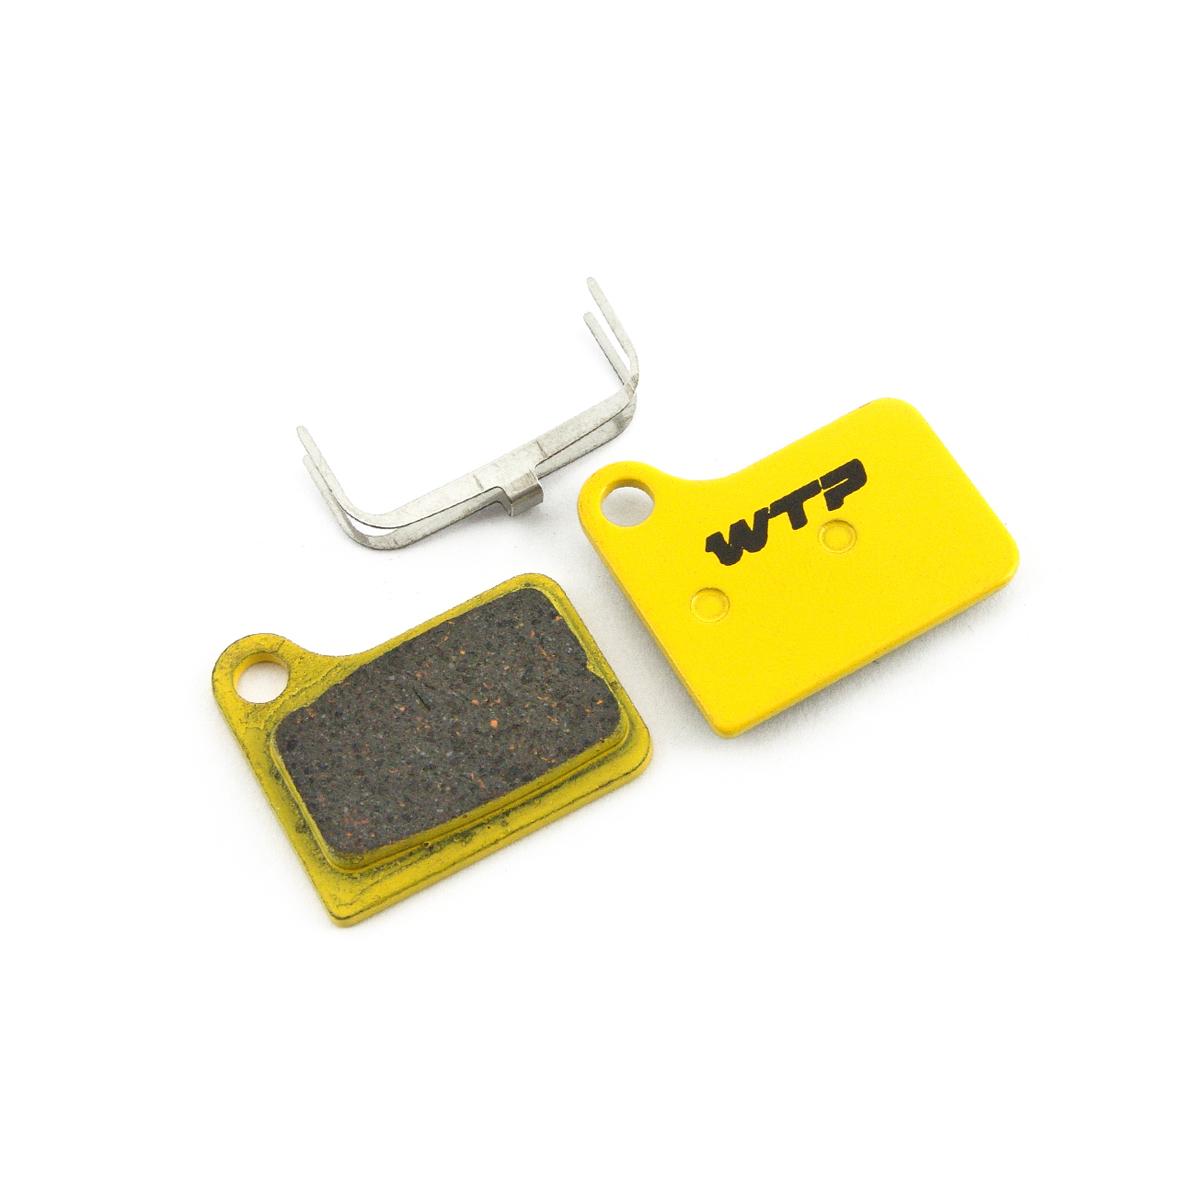 Plaquettes de frein vélo WTP compatibles Shimano Deore / Nexave hydrauliques